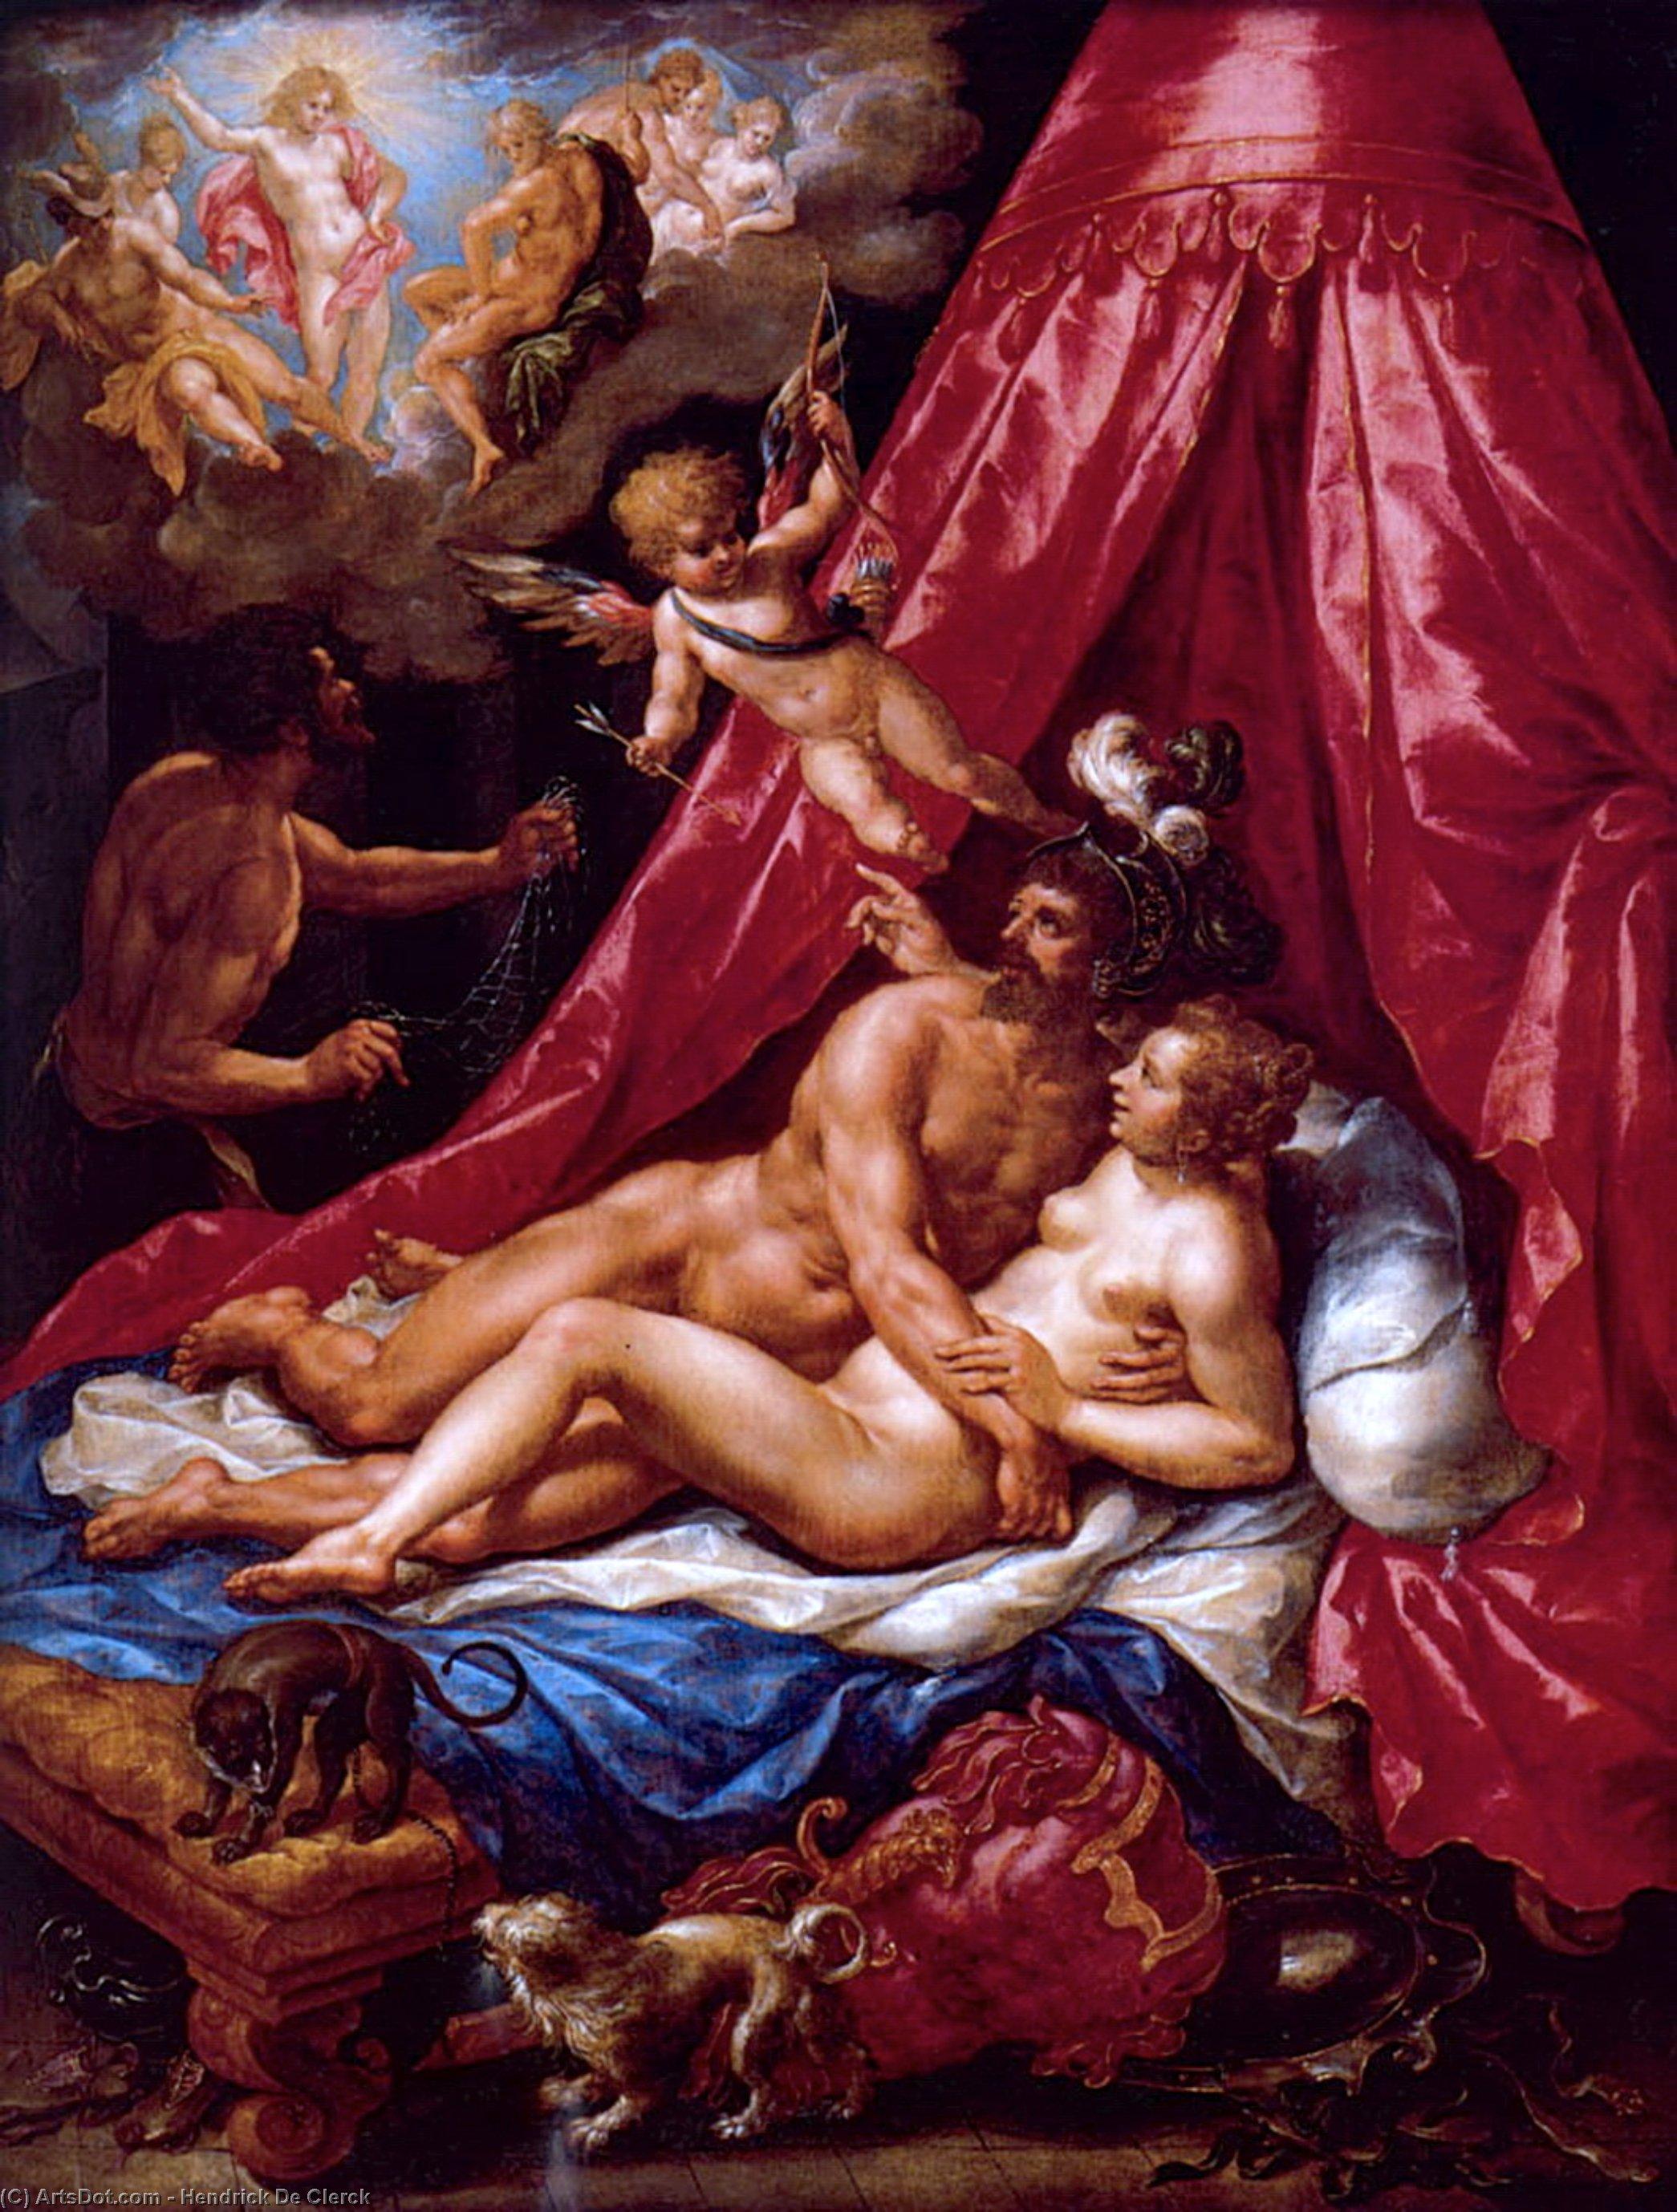 Wikioo.org - The Encyclopedia of Fine Arts - Painting, Artwork by Hendrick De Clerck - Mars and Venus